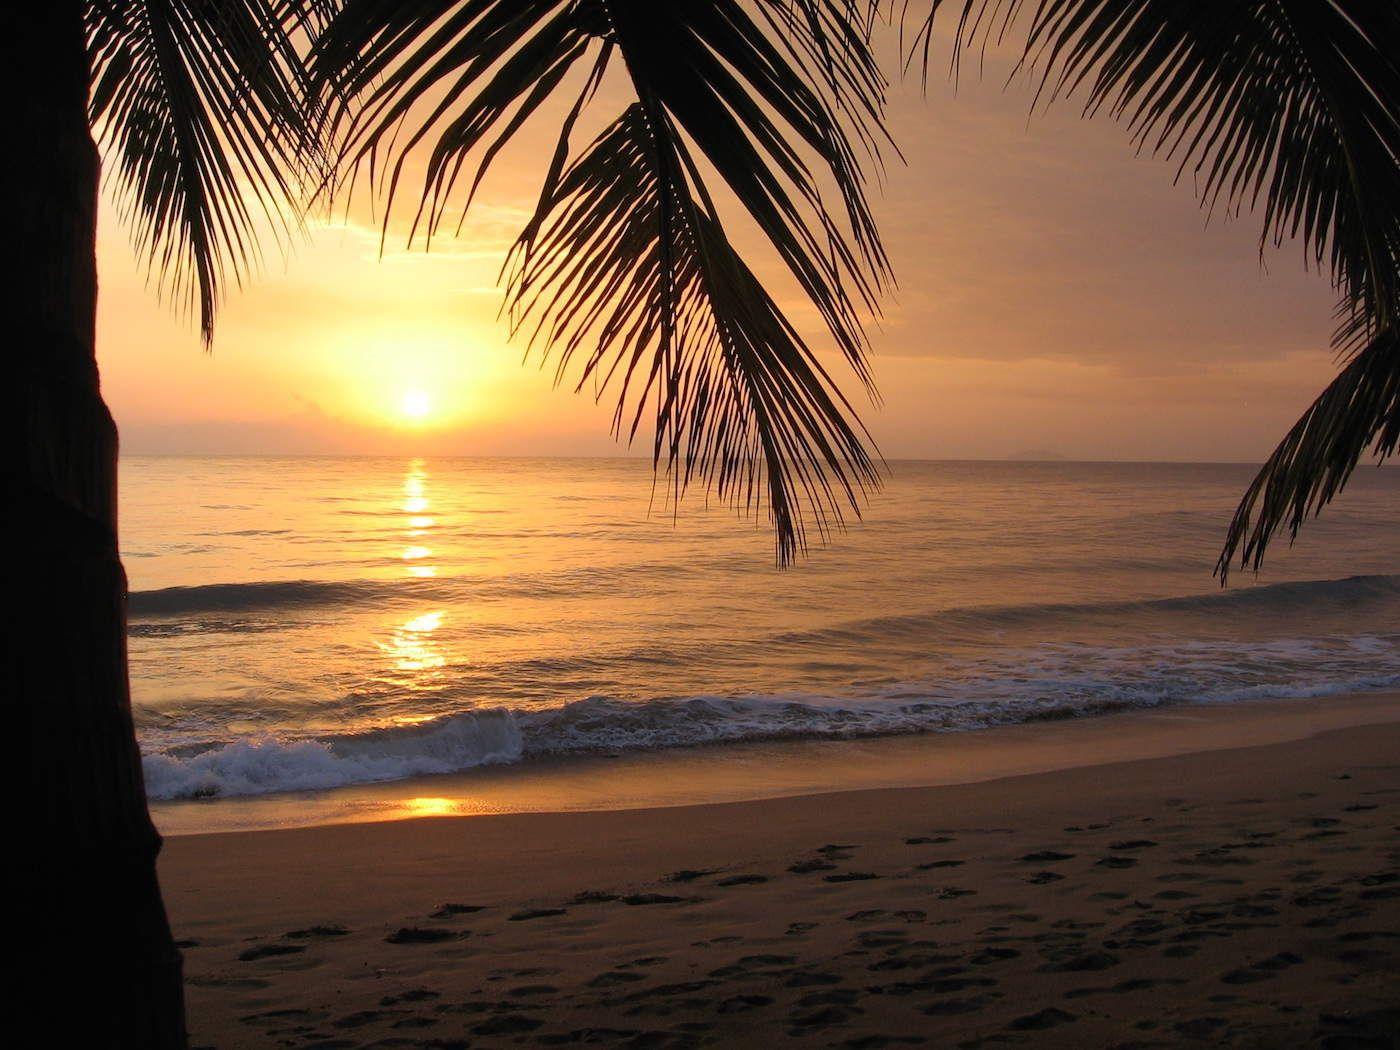 The Cheapest Caribbean Vacation Paradises Cheap Caribbean - Cheapest caribbean vacation